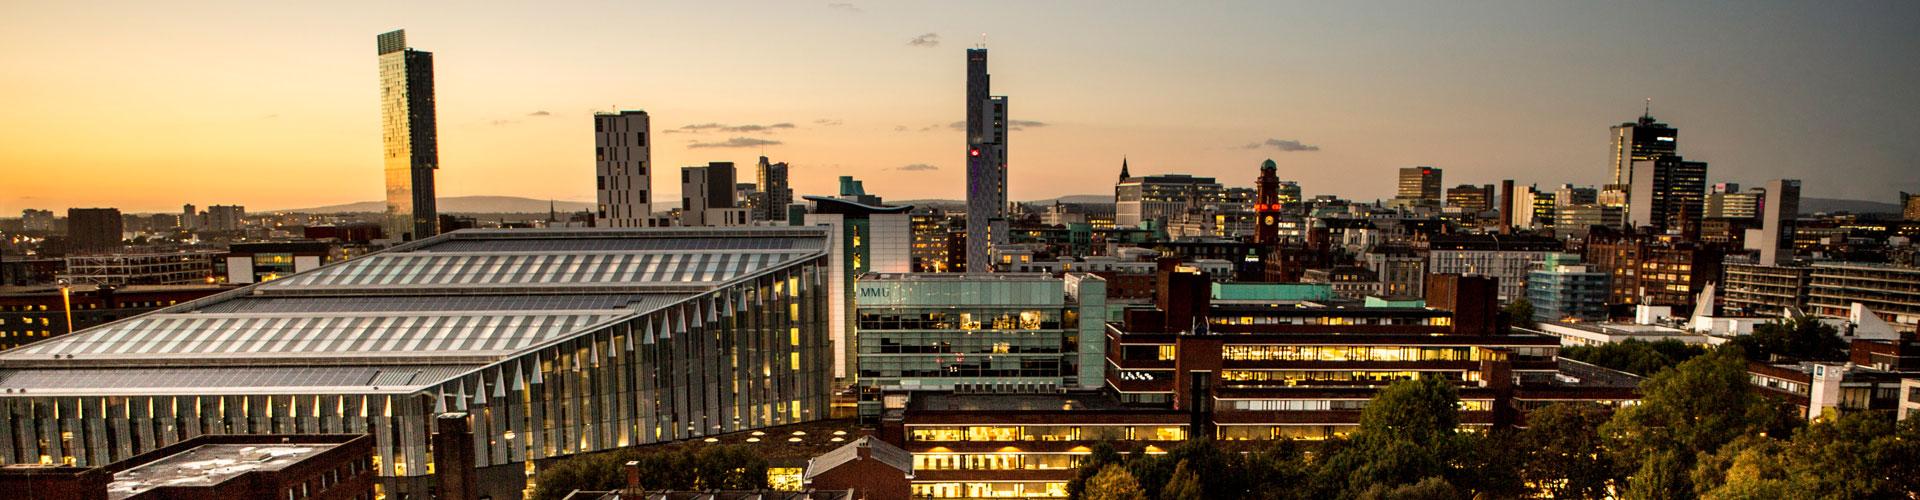 Student Jobs - PrintCity - Manchester Metropolitan University